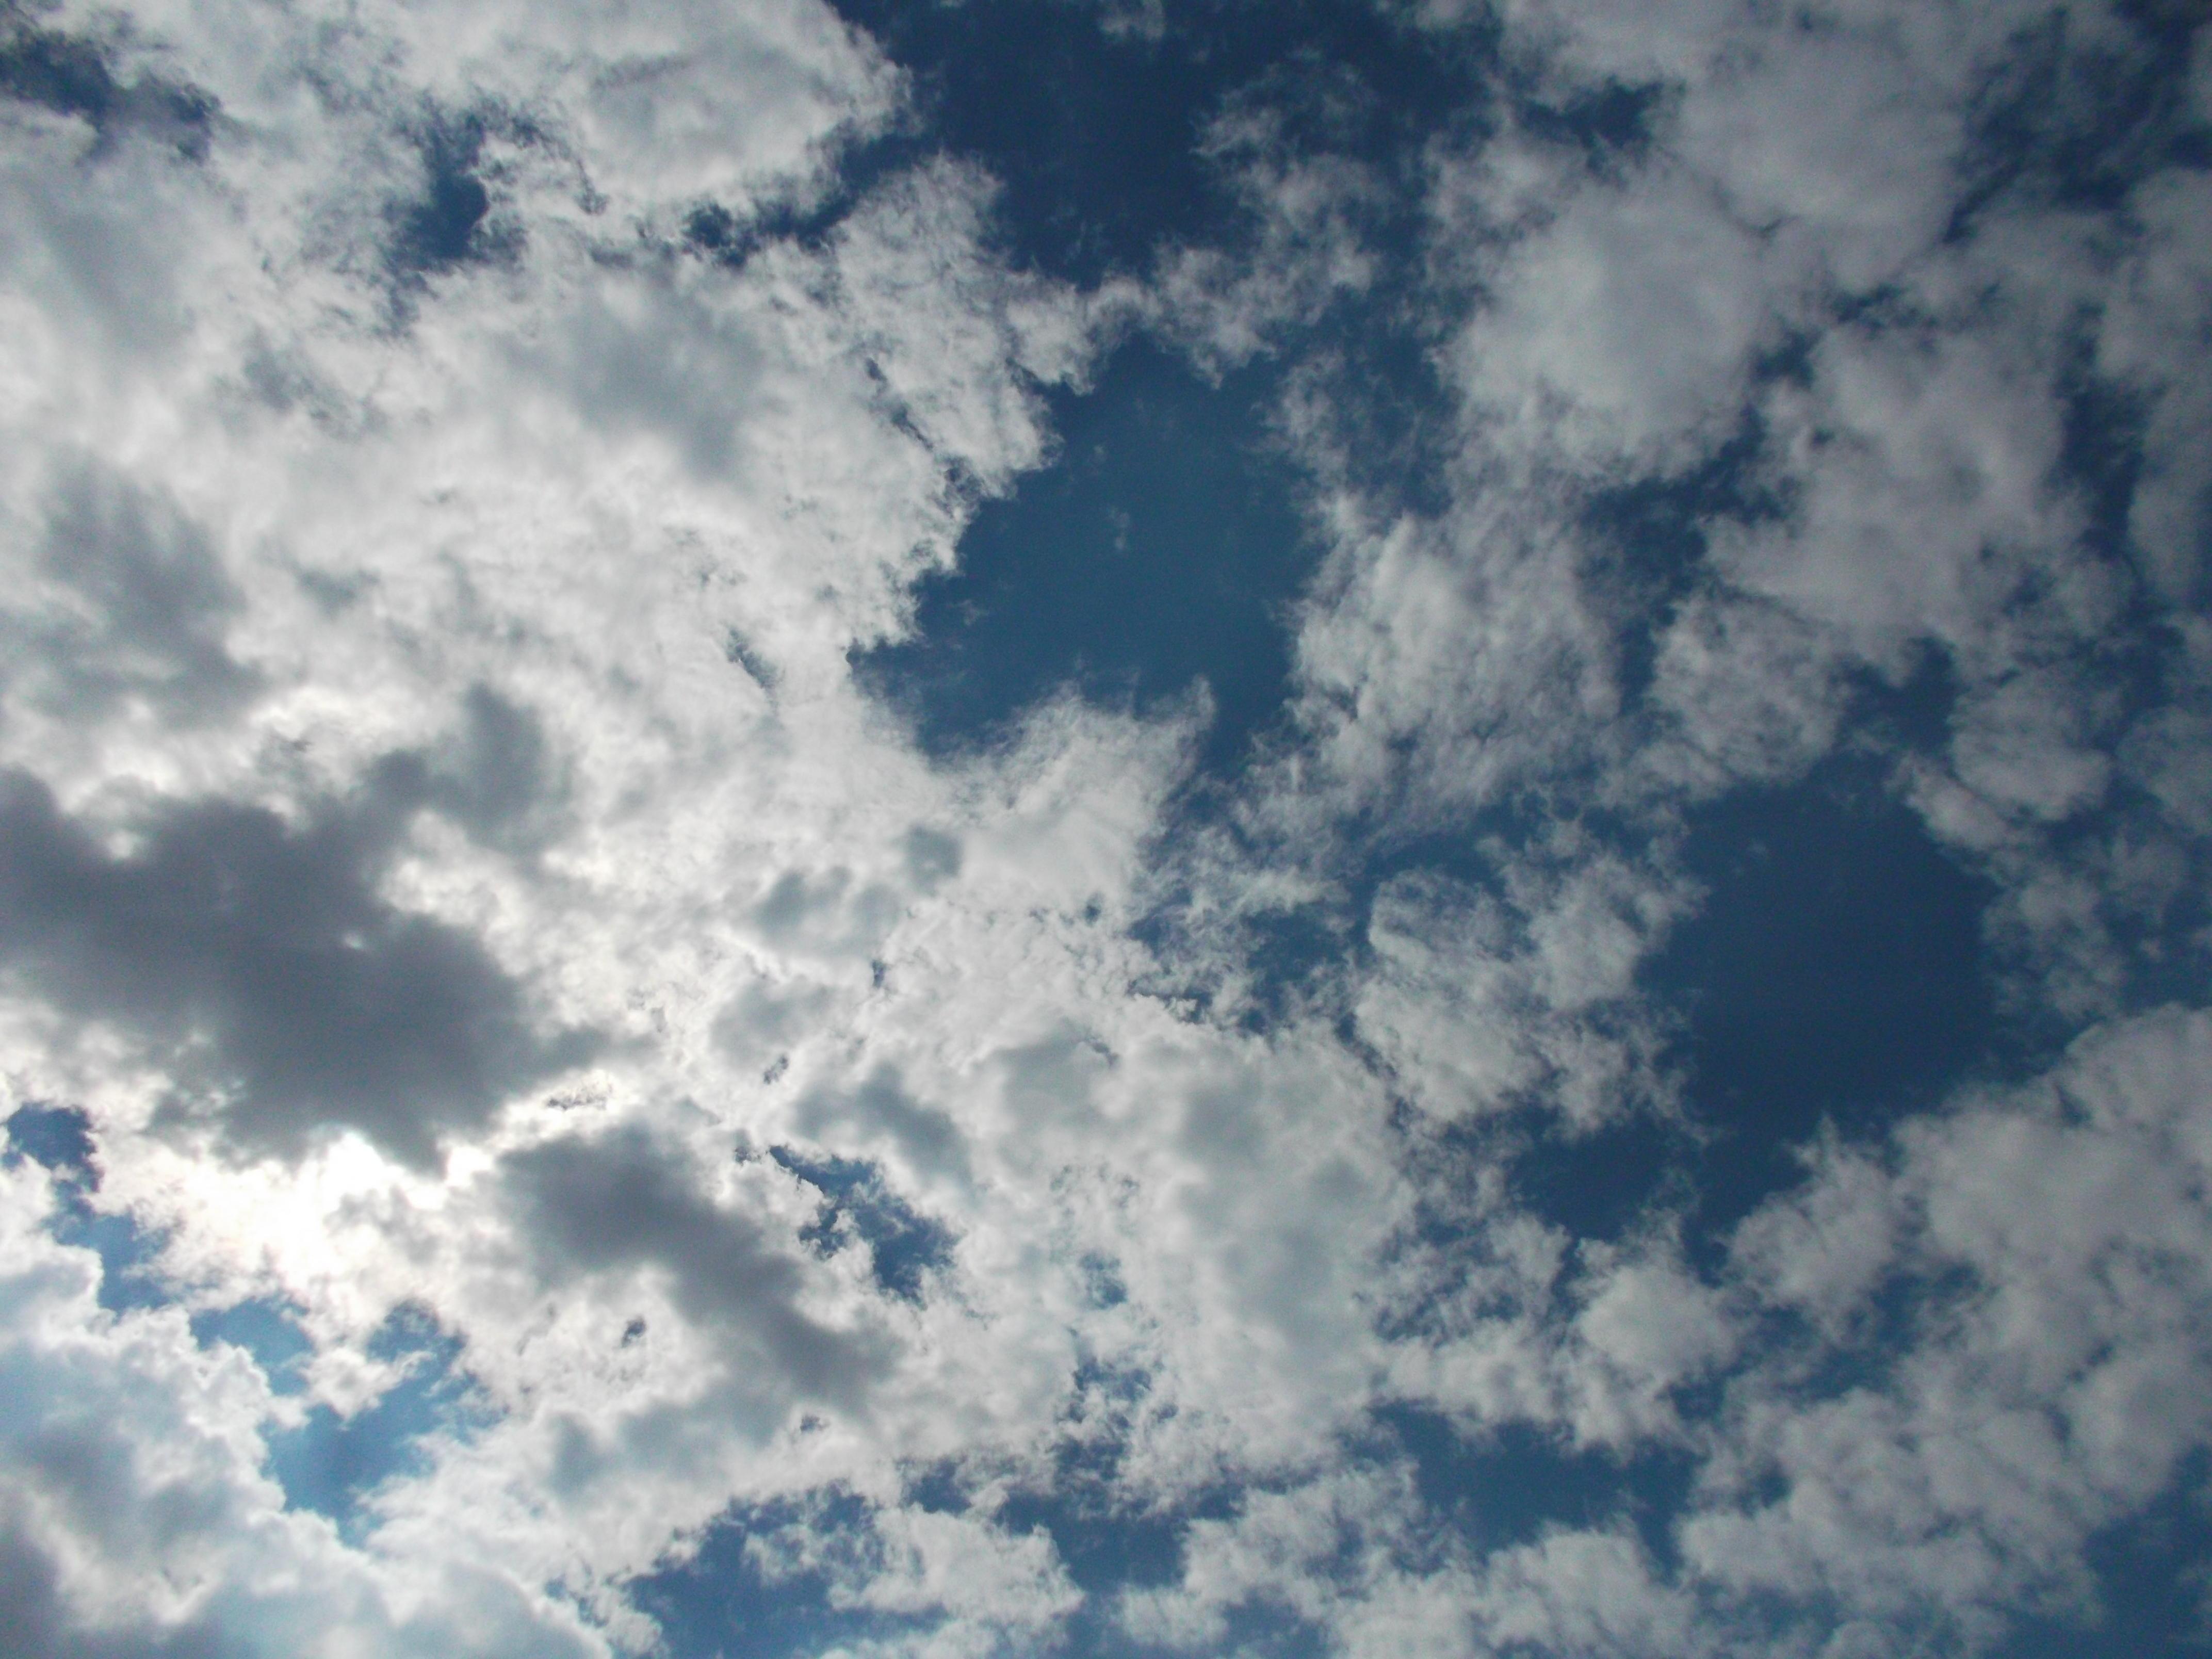 2013-06-06 Longitude -0.371 Latitude 49.182 Altitude 29 Heure 15h00